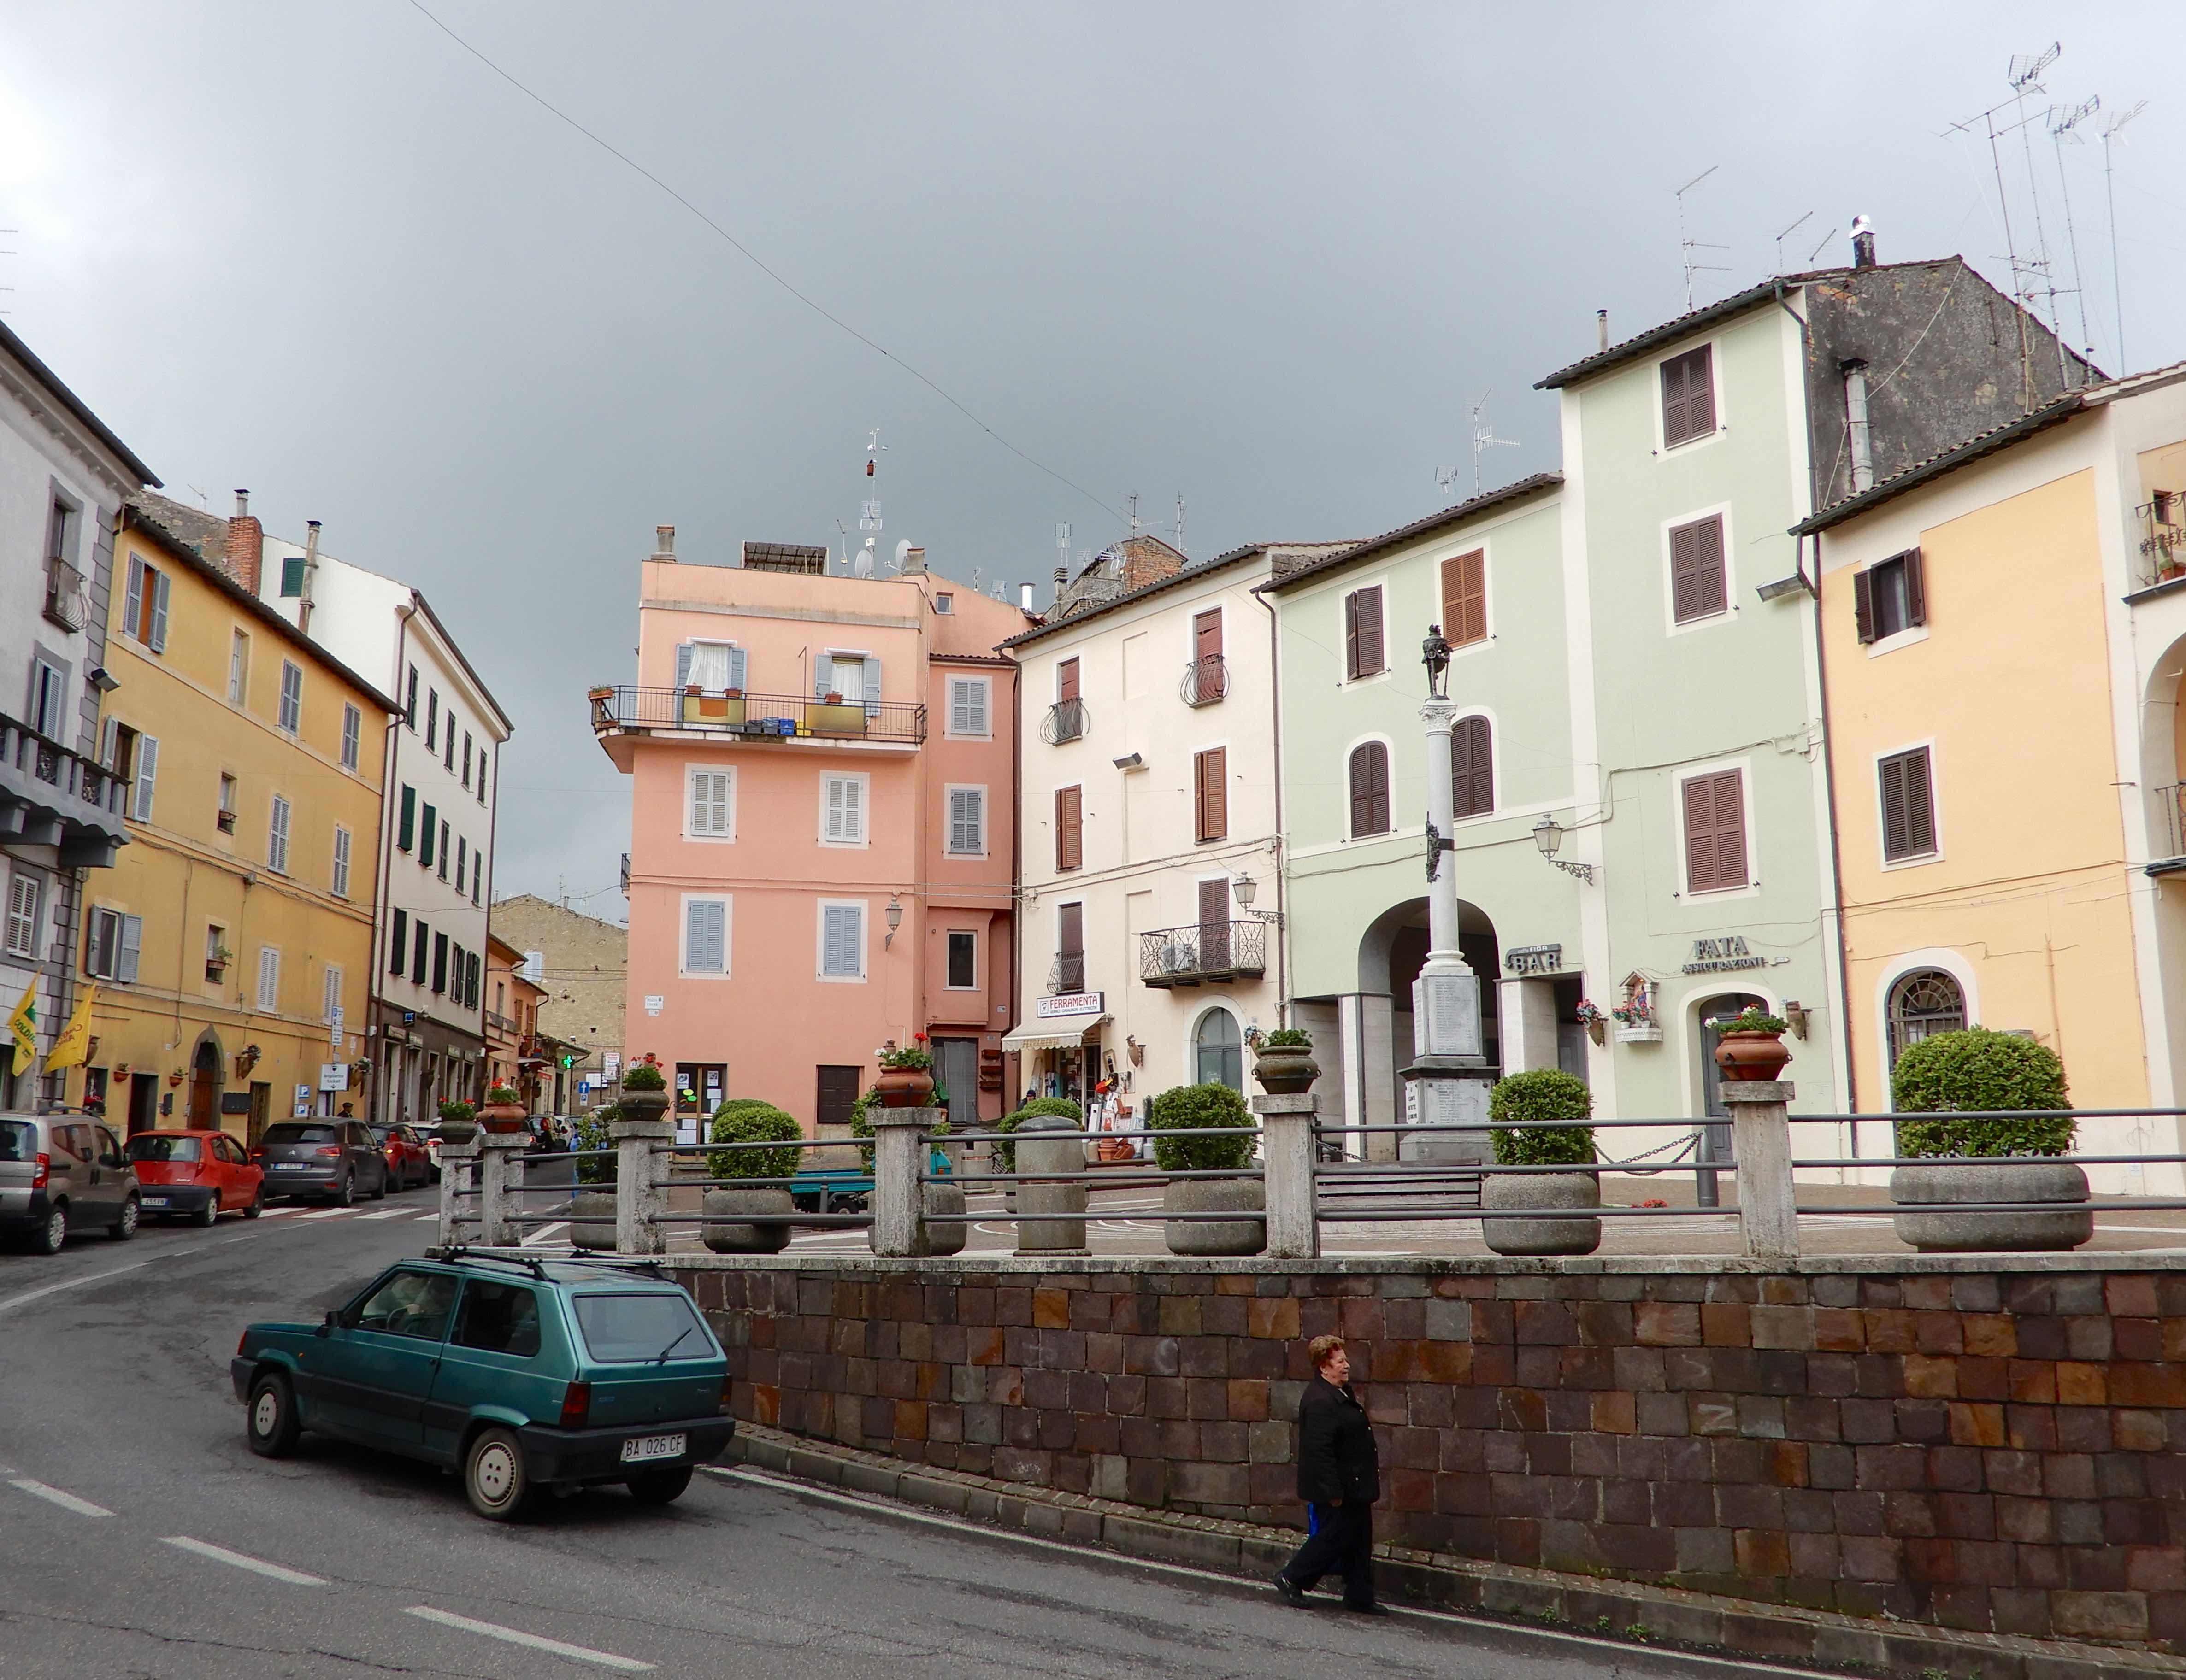 6.Piazza Cavour